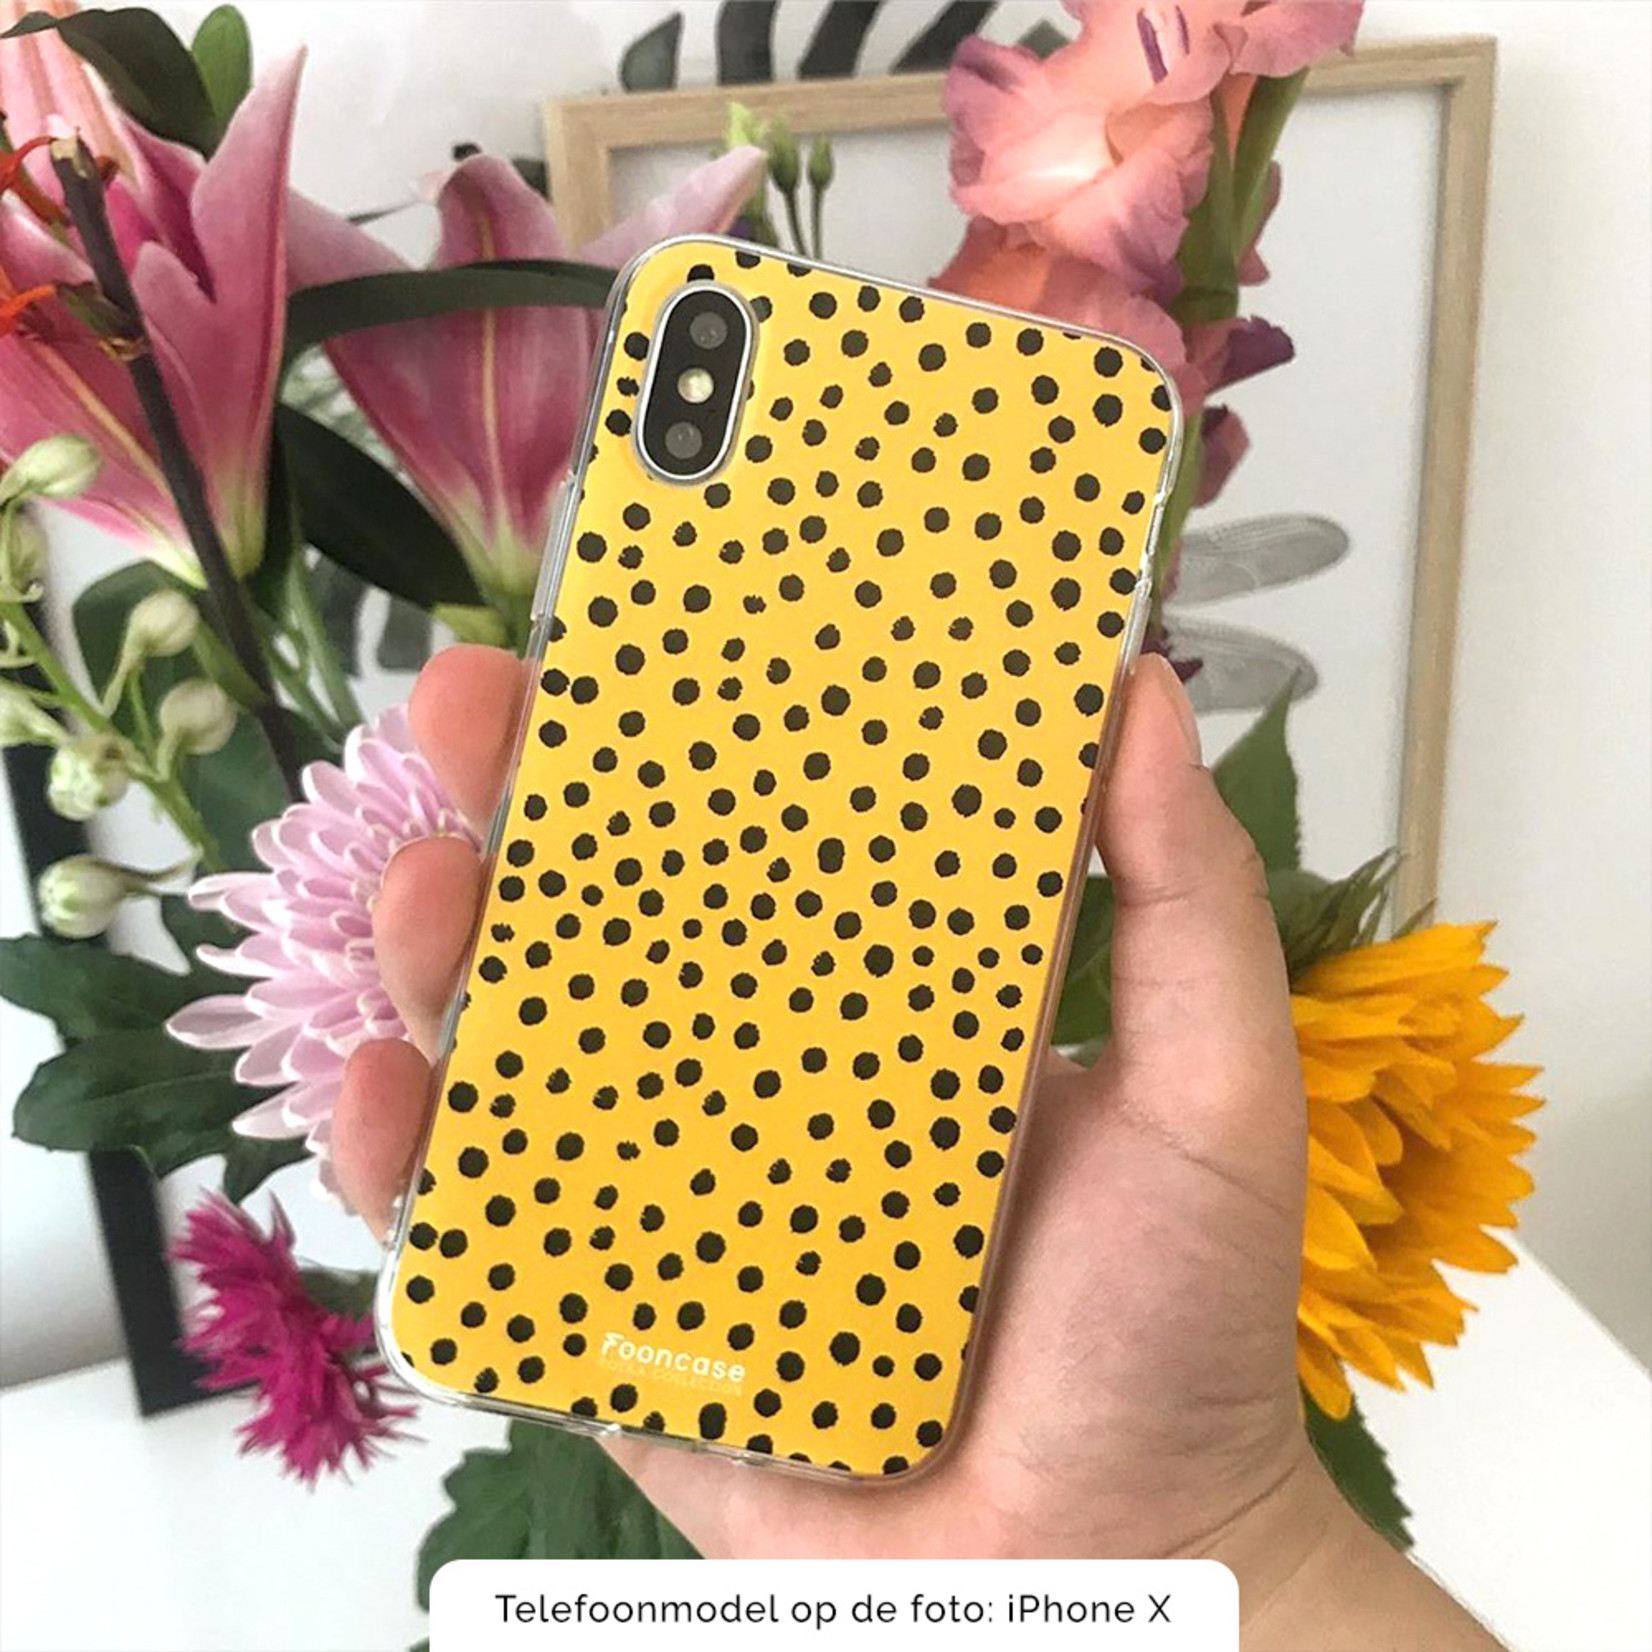 FOONCASE Samsung Galaxy S9 hoesje TPU Soft Case - Back Cover - POLKA COLLECTION / Stipjes / Stippen / Oker Geel